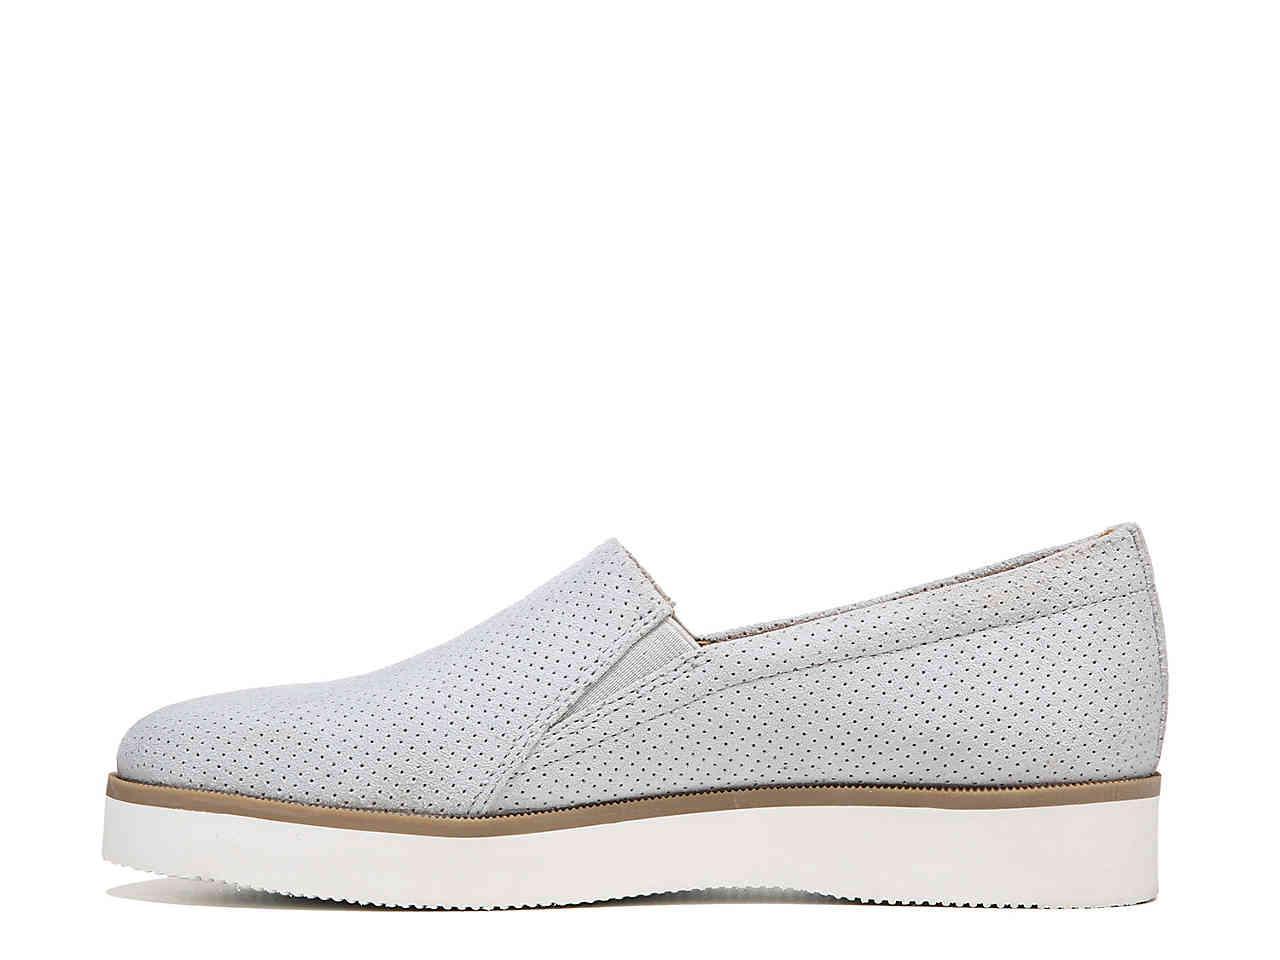 Naturalizer Zophie 2 Slip-on Sneaker in